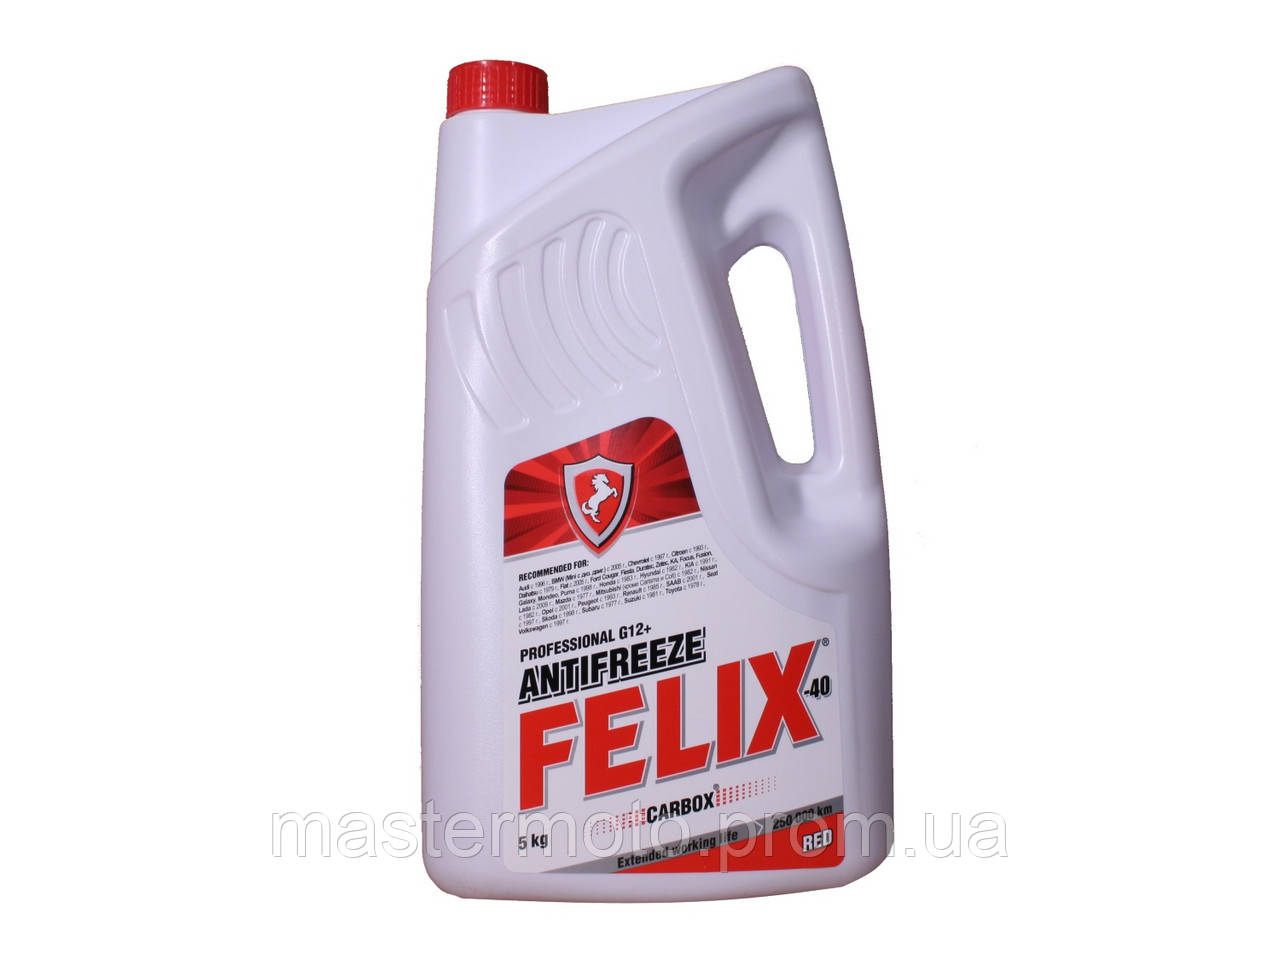 "Антифриз ""FELIX CARBOX G12+"", 5л."